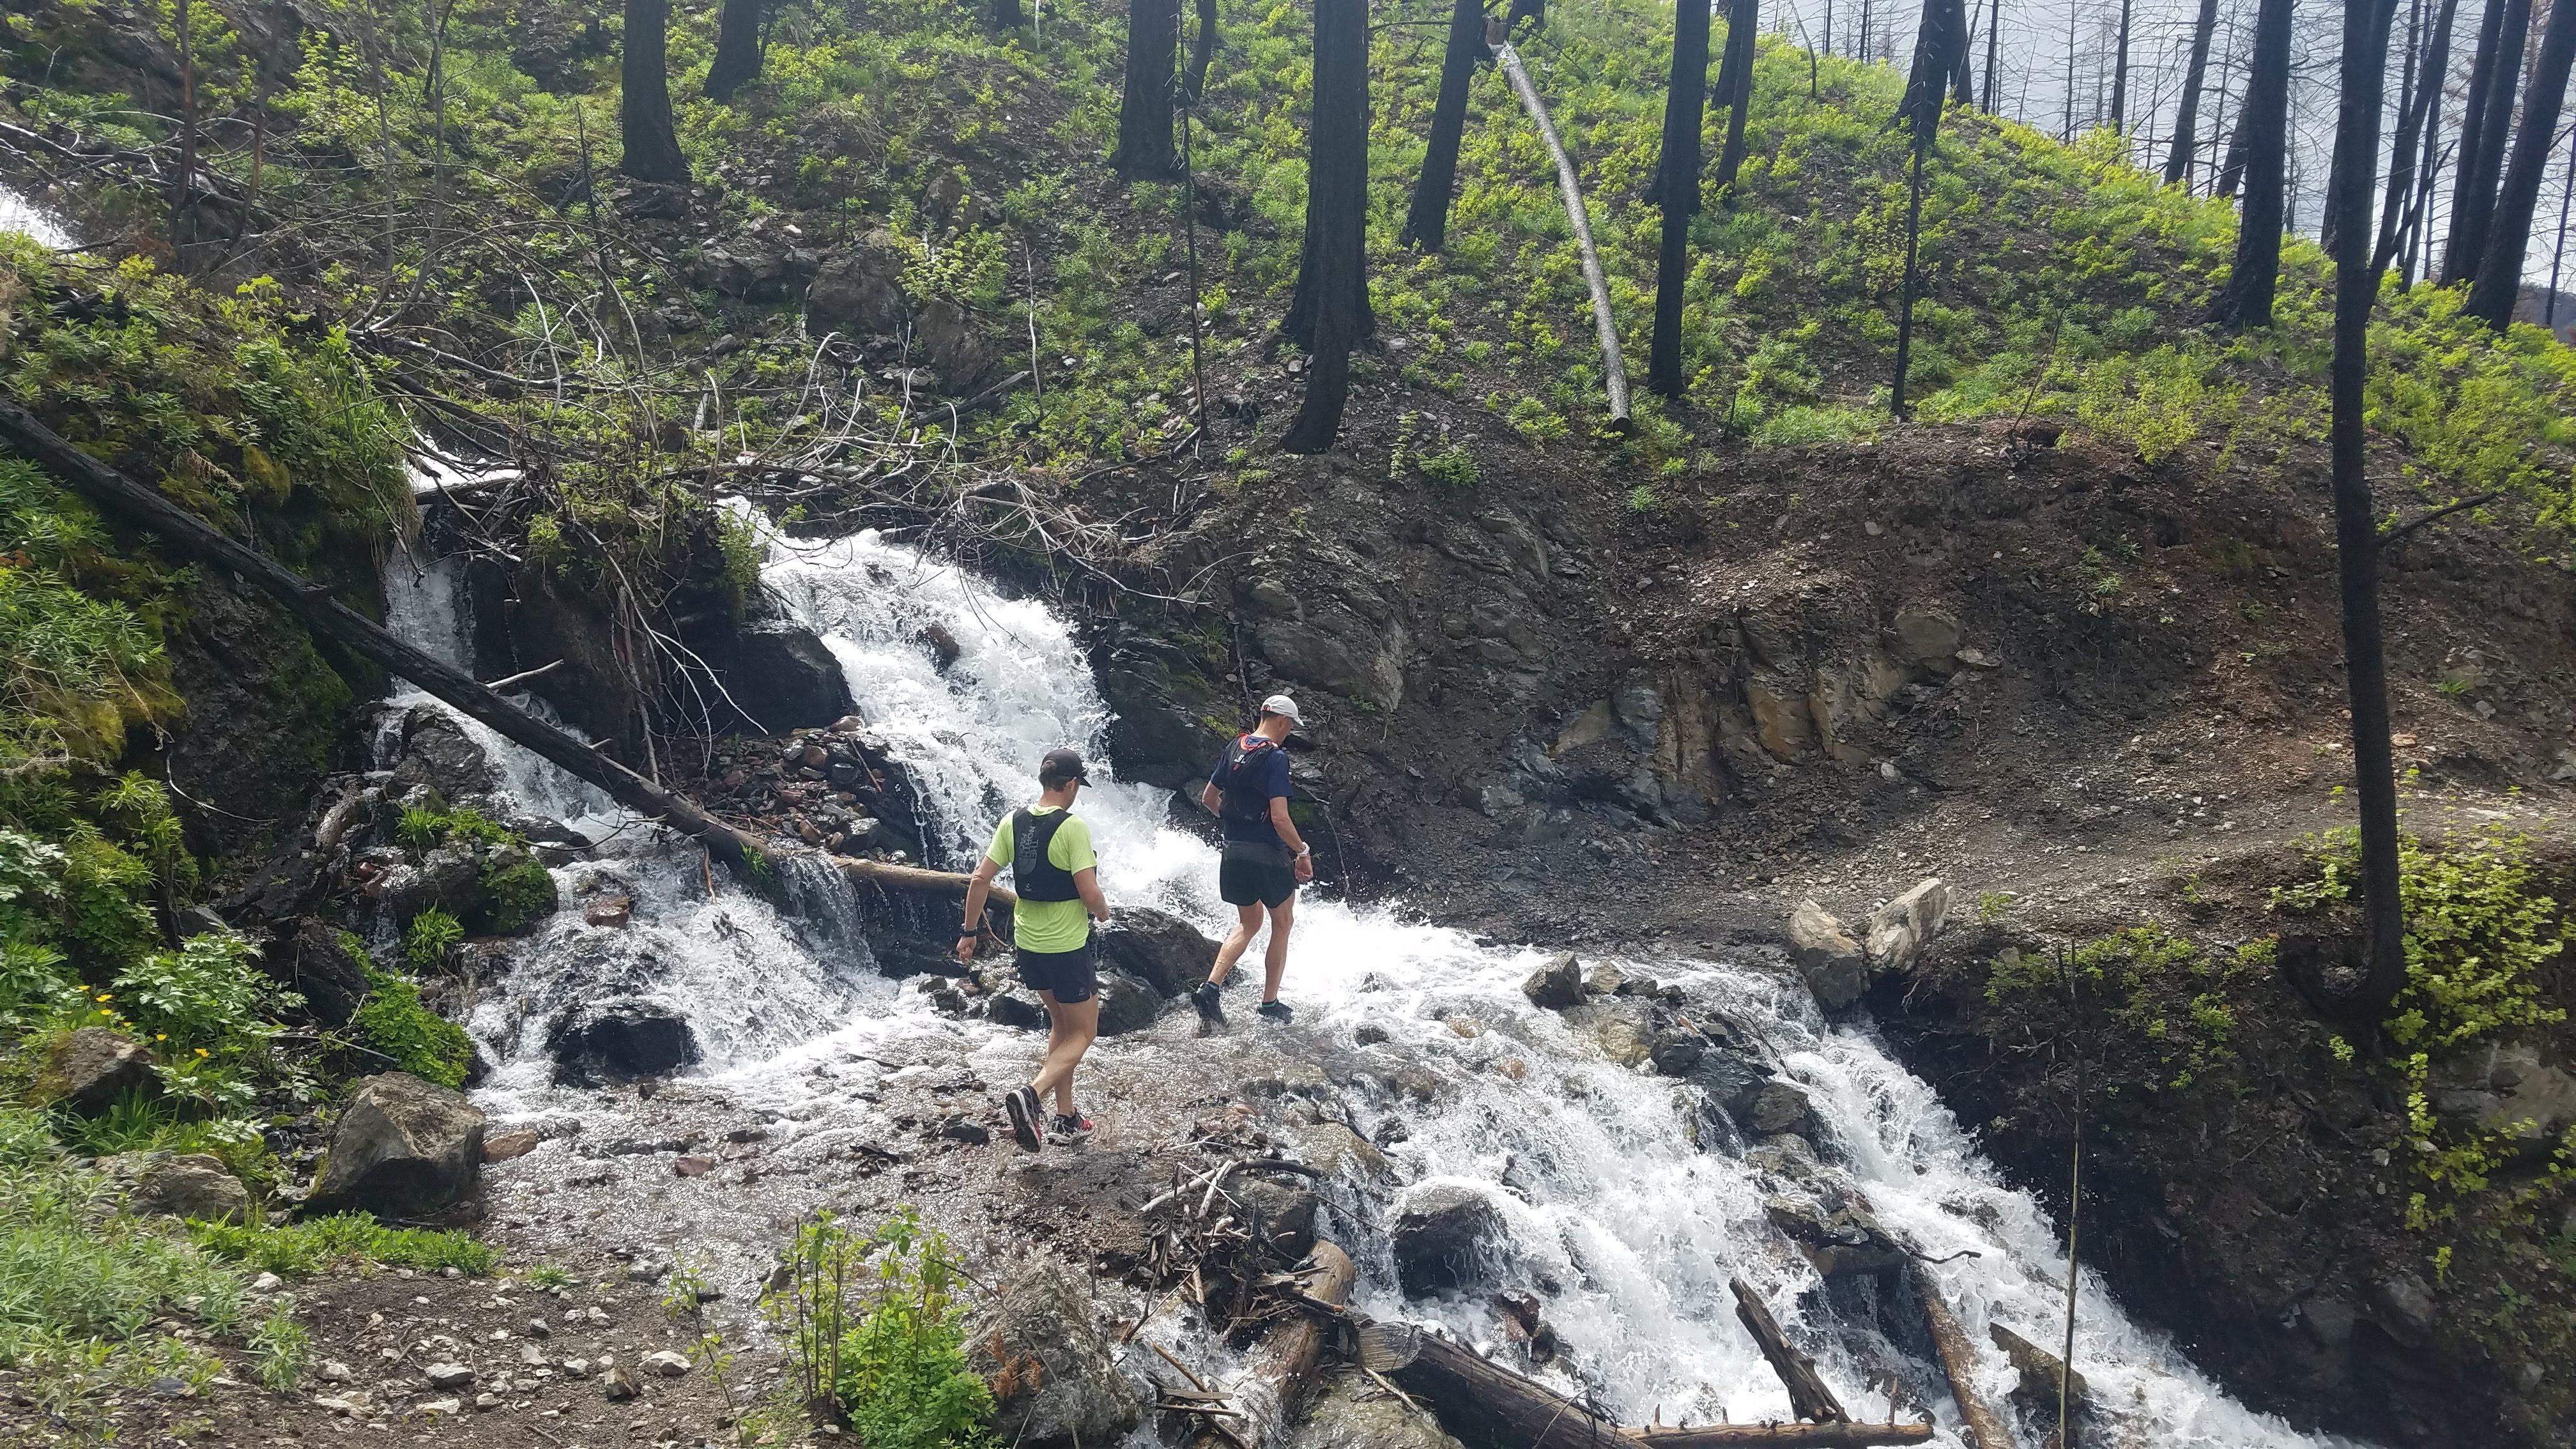 Monture Creek Trail